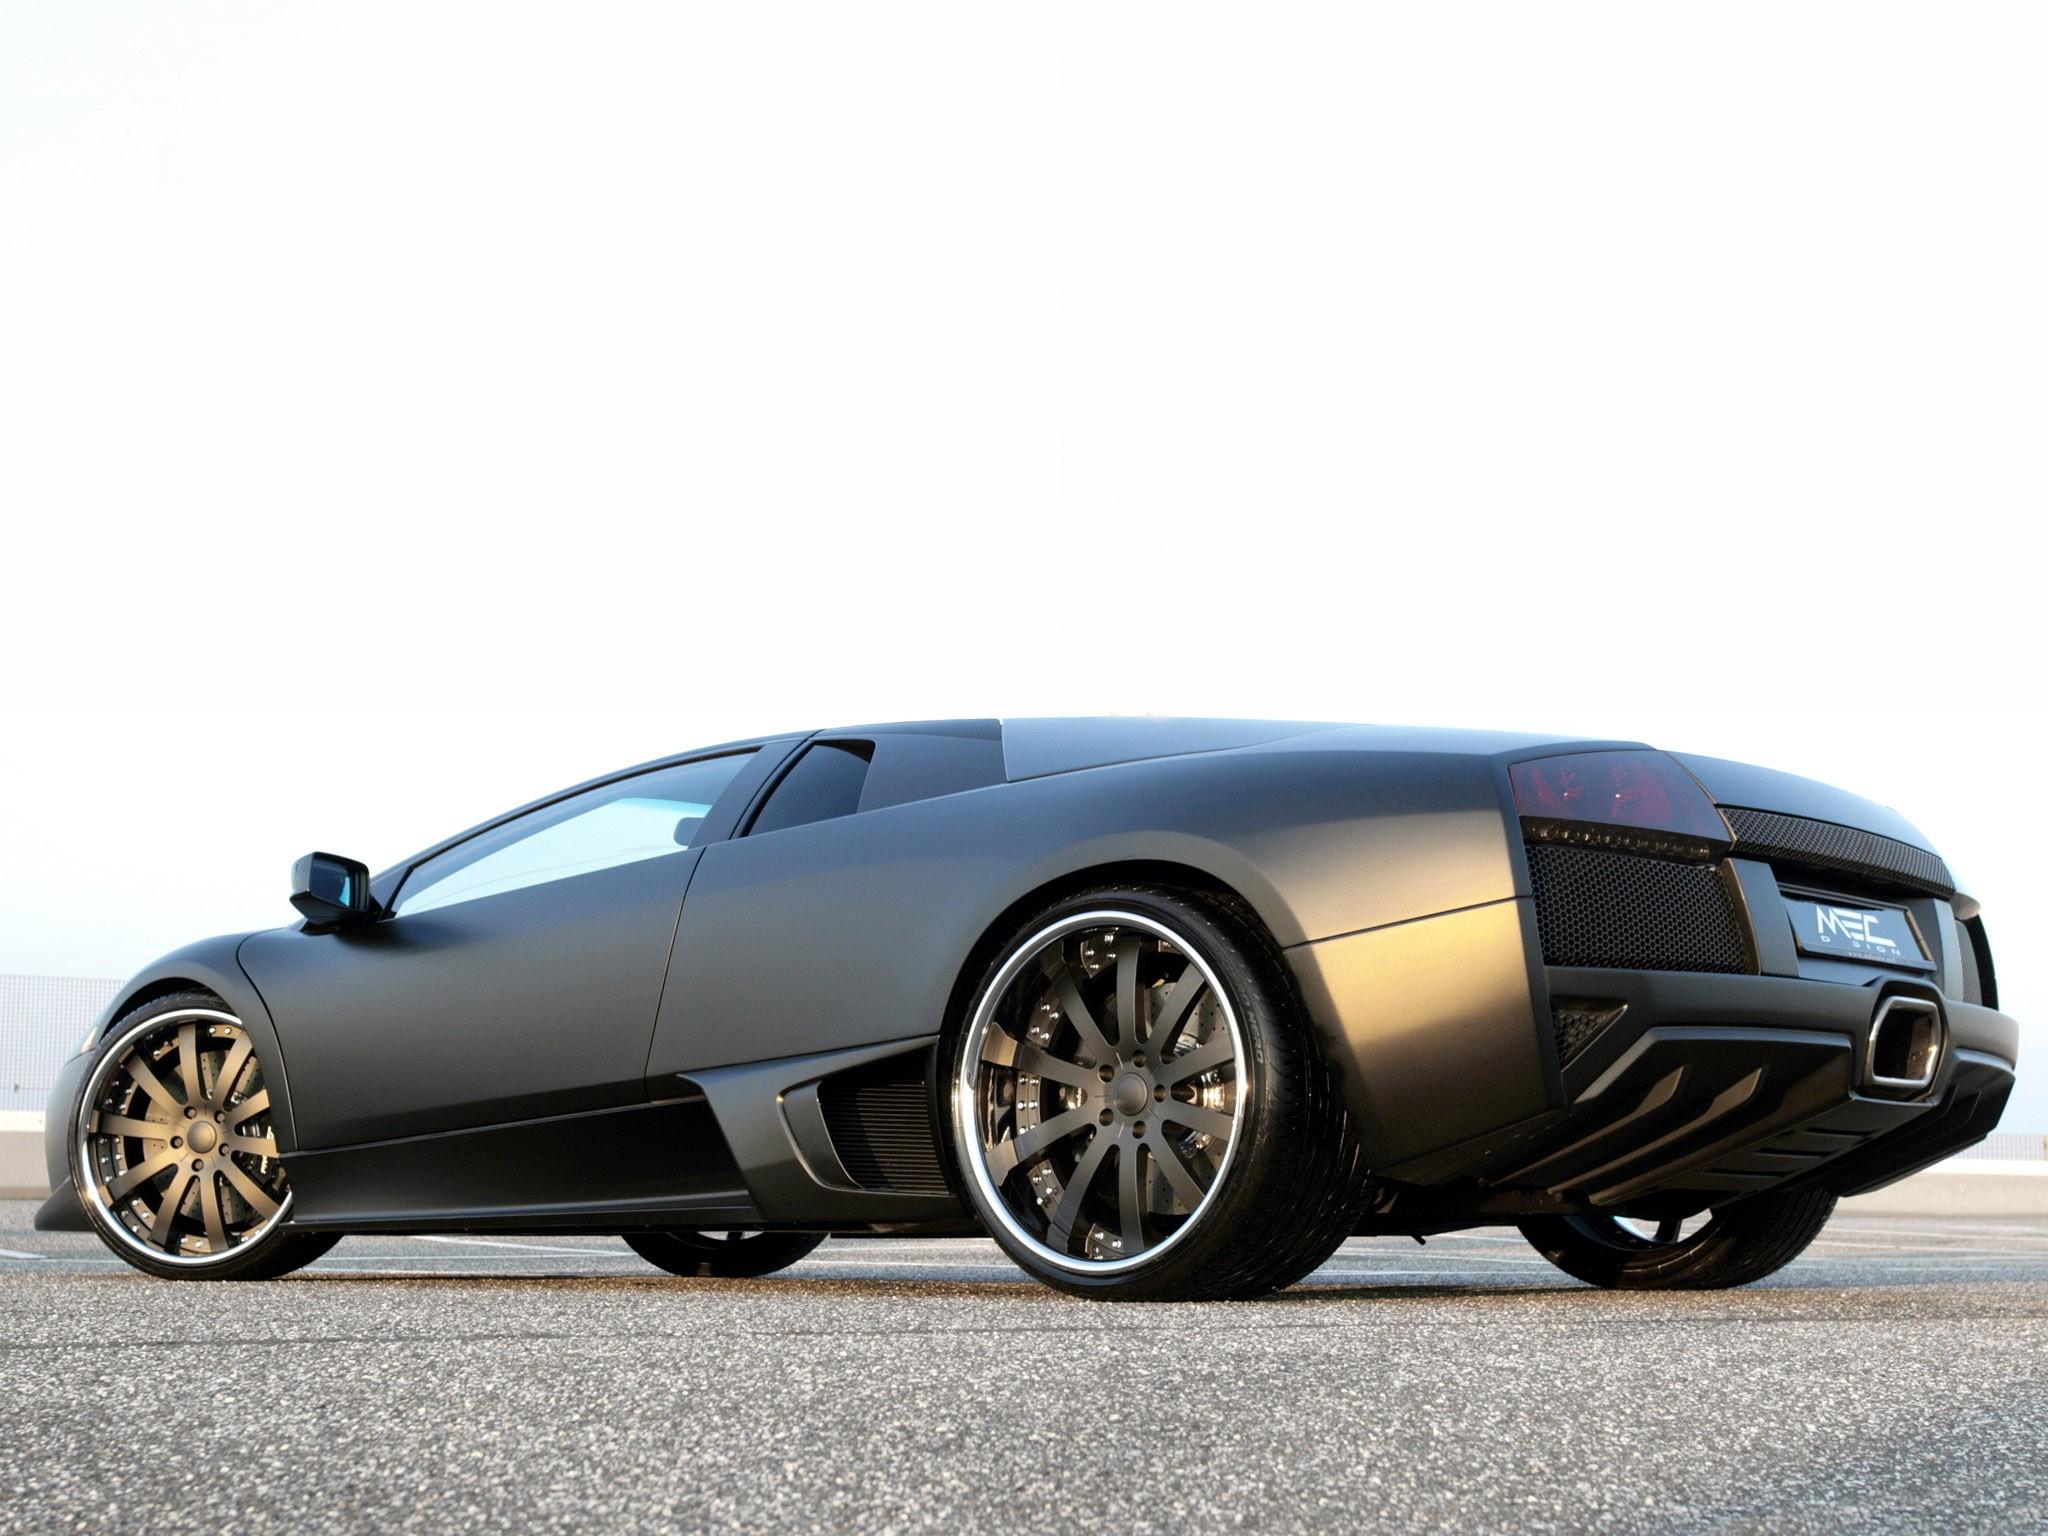 2010 Mec Design - Lamborghini Murcielago Yeniceri Edition